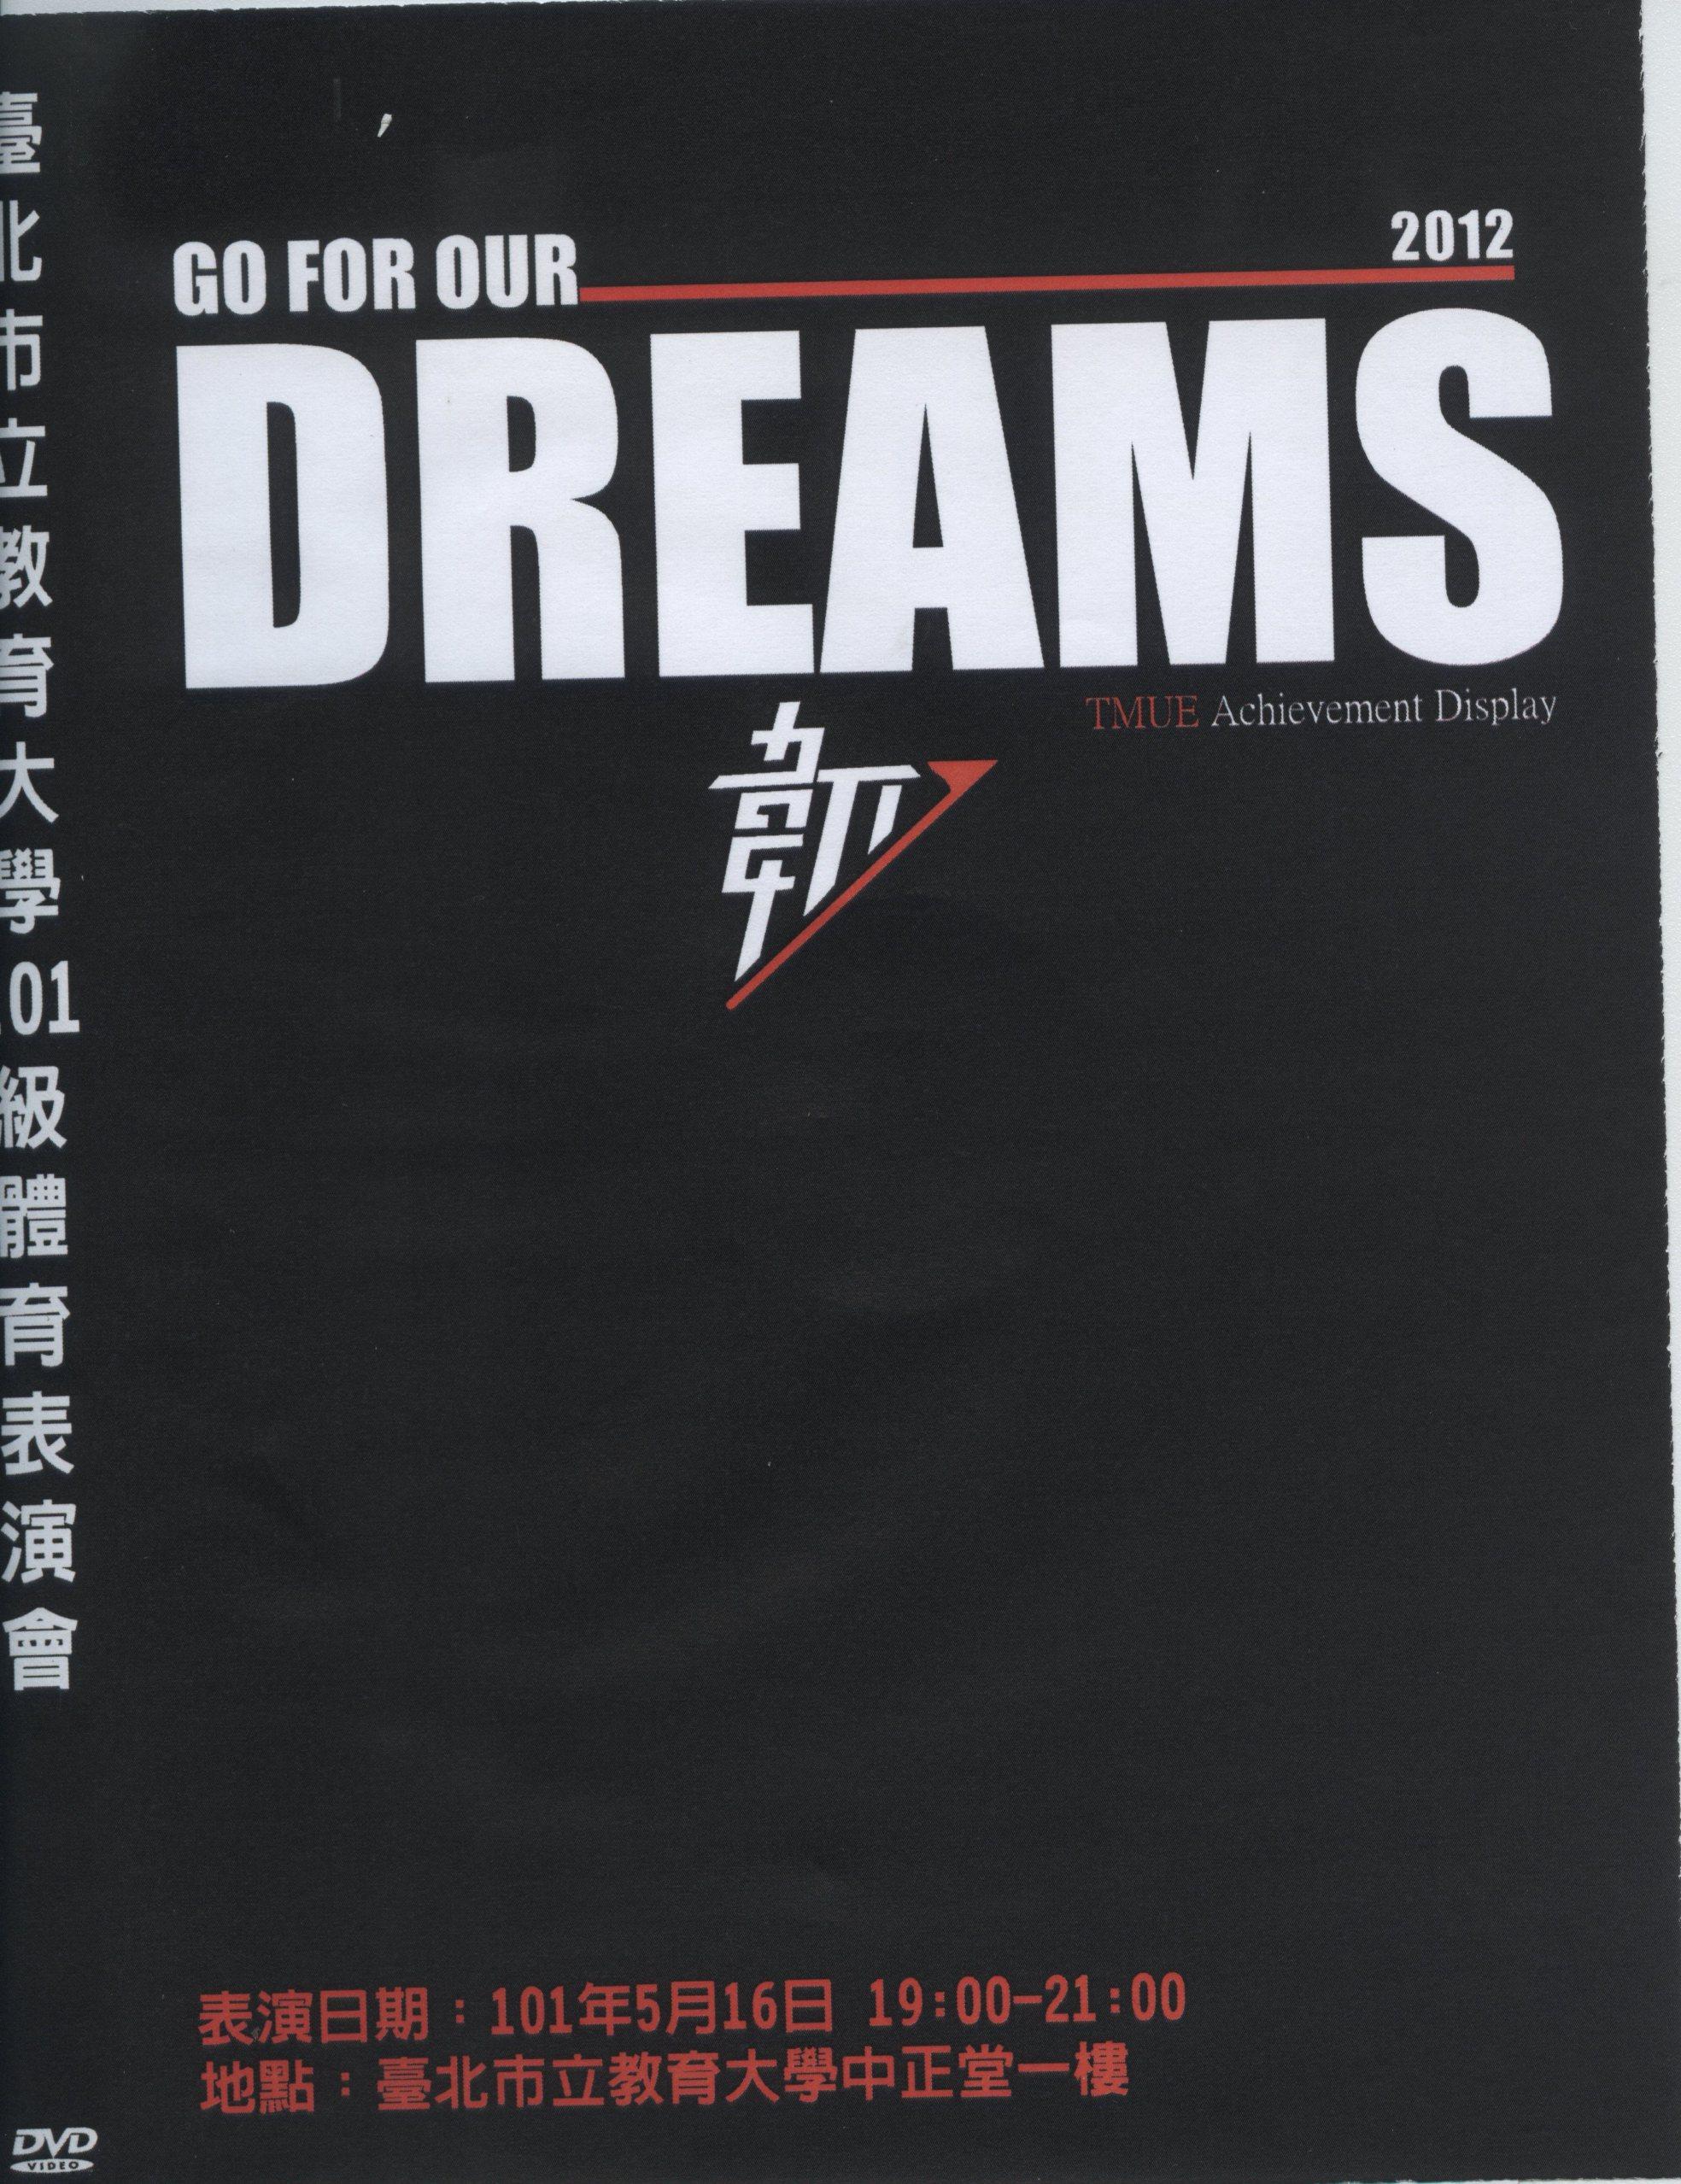 臺北市立教育大學101級體育表演會 韌 = Go for our dreams /